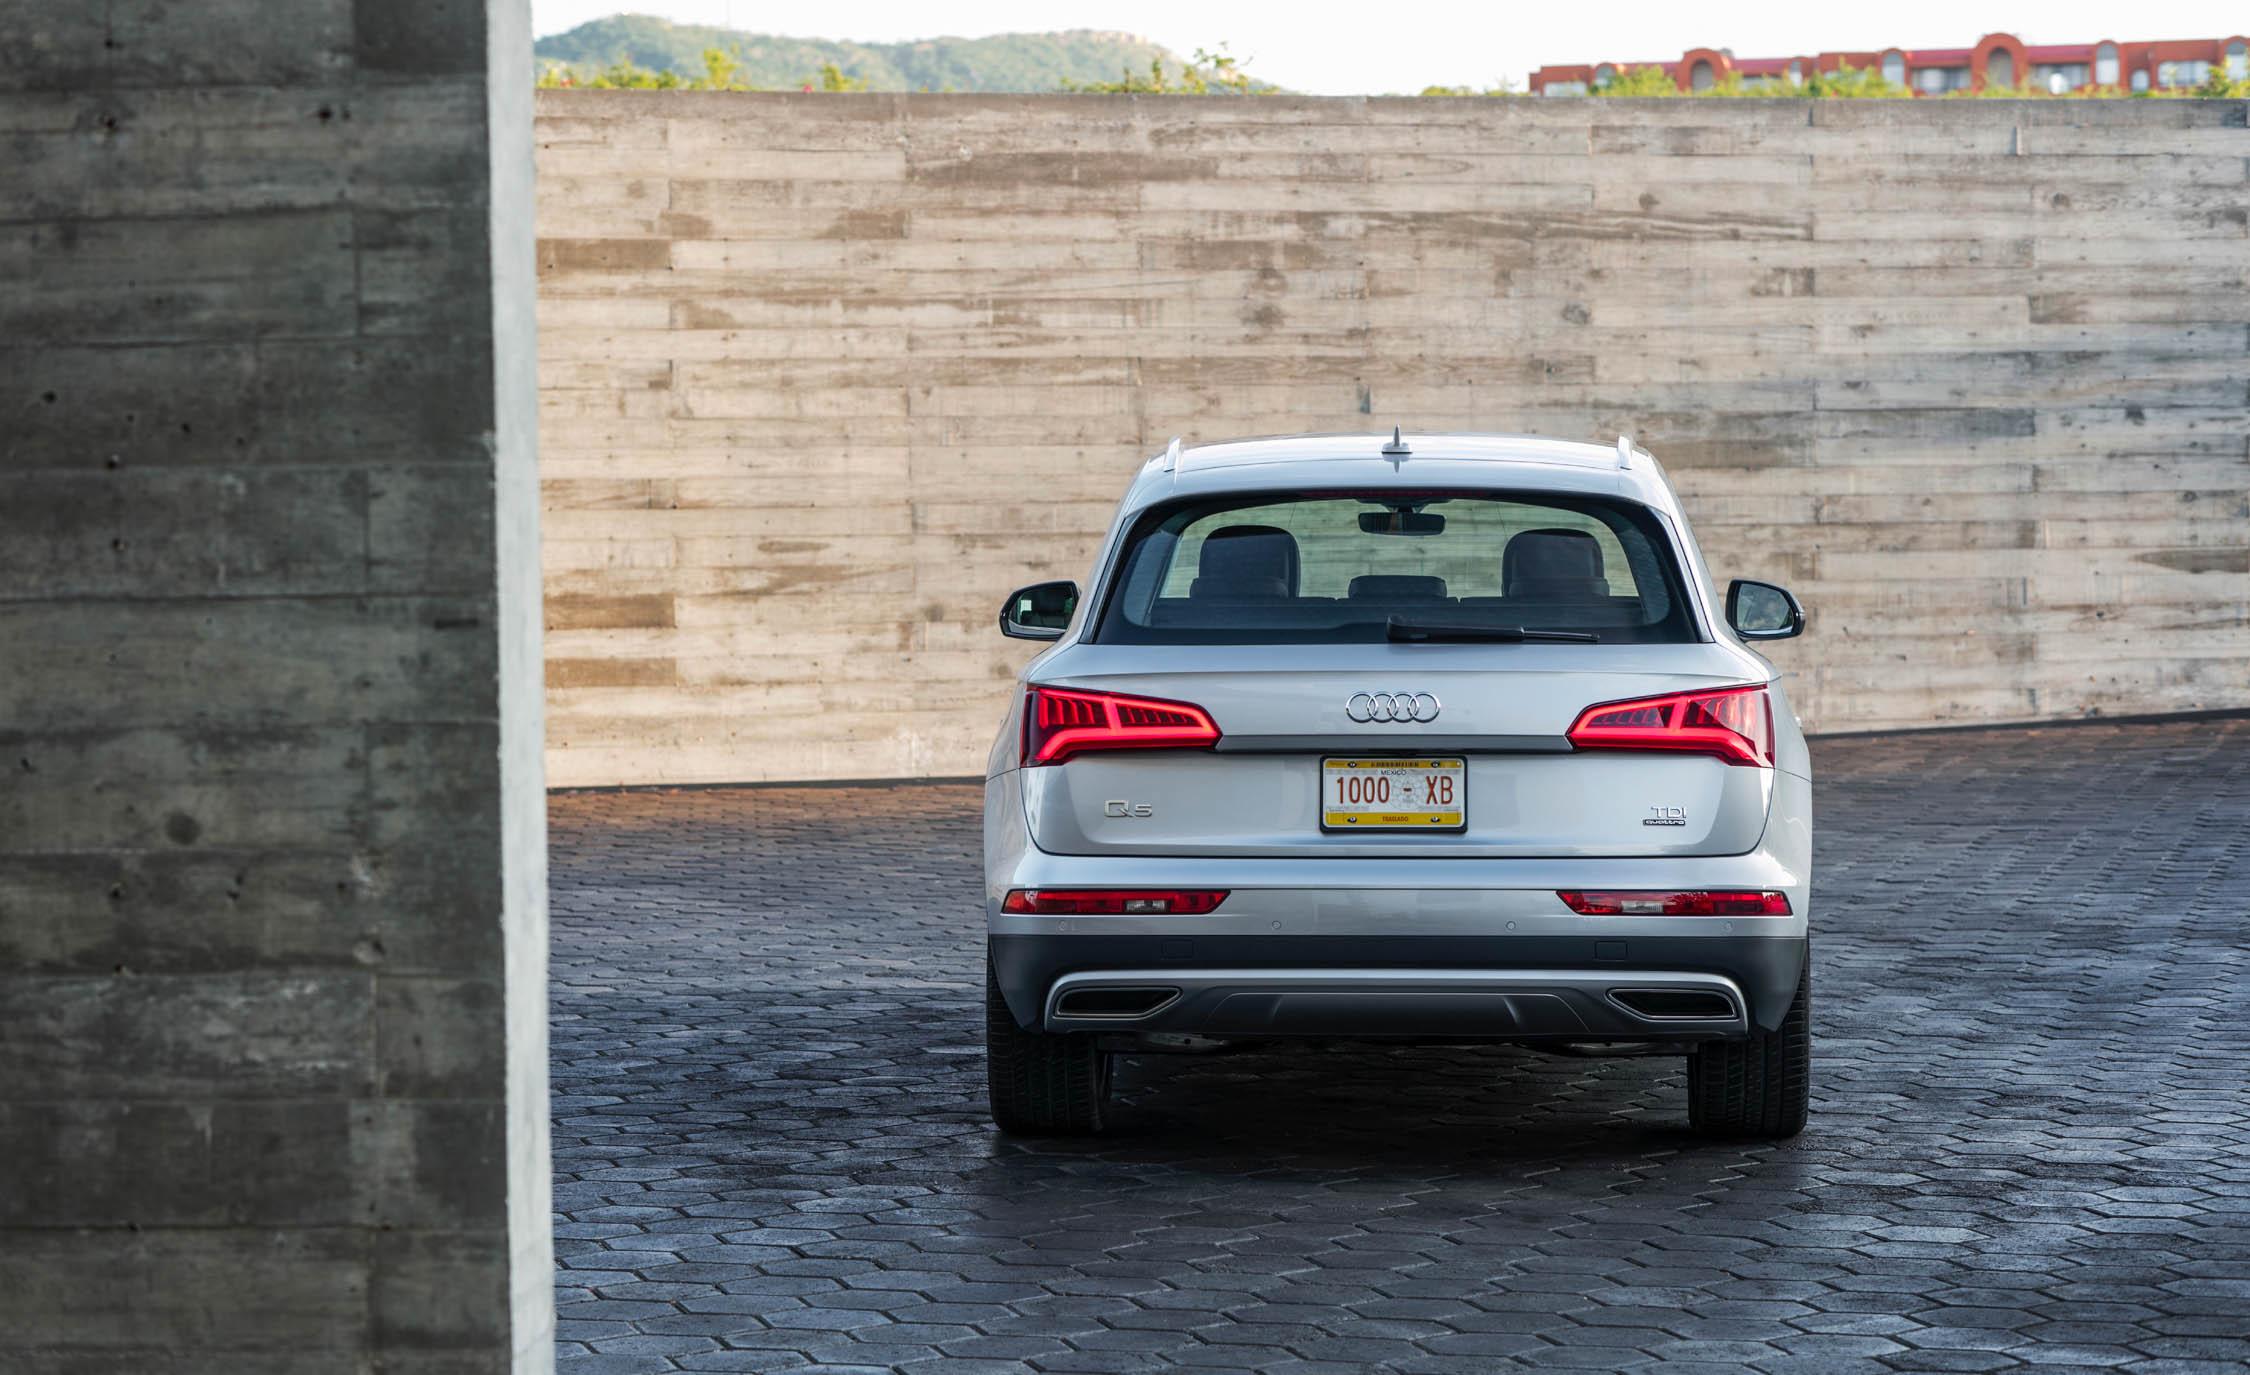 2018 Audi Q (View 40 of 40)